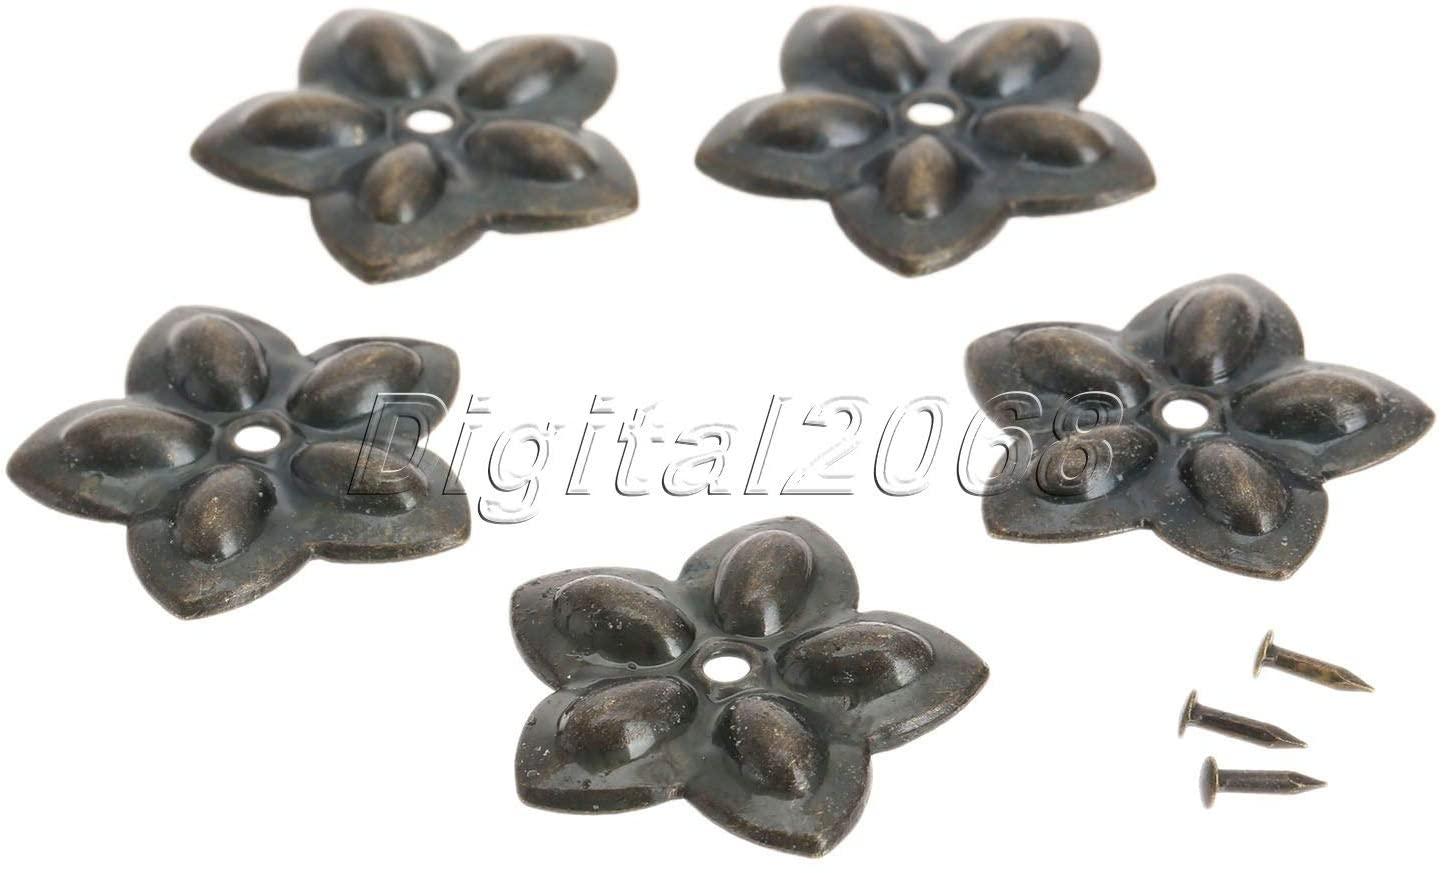 Ochoos New Useful 100Pcs Bronze Vintage Furniture Decorative Upholstery Nails Tacks Studs Furniture Fix 22x23mm